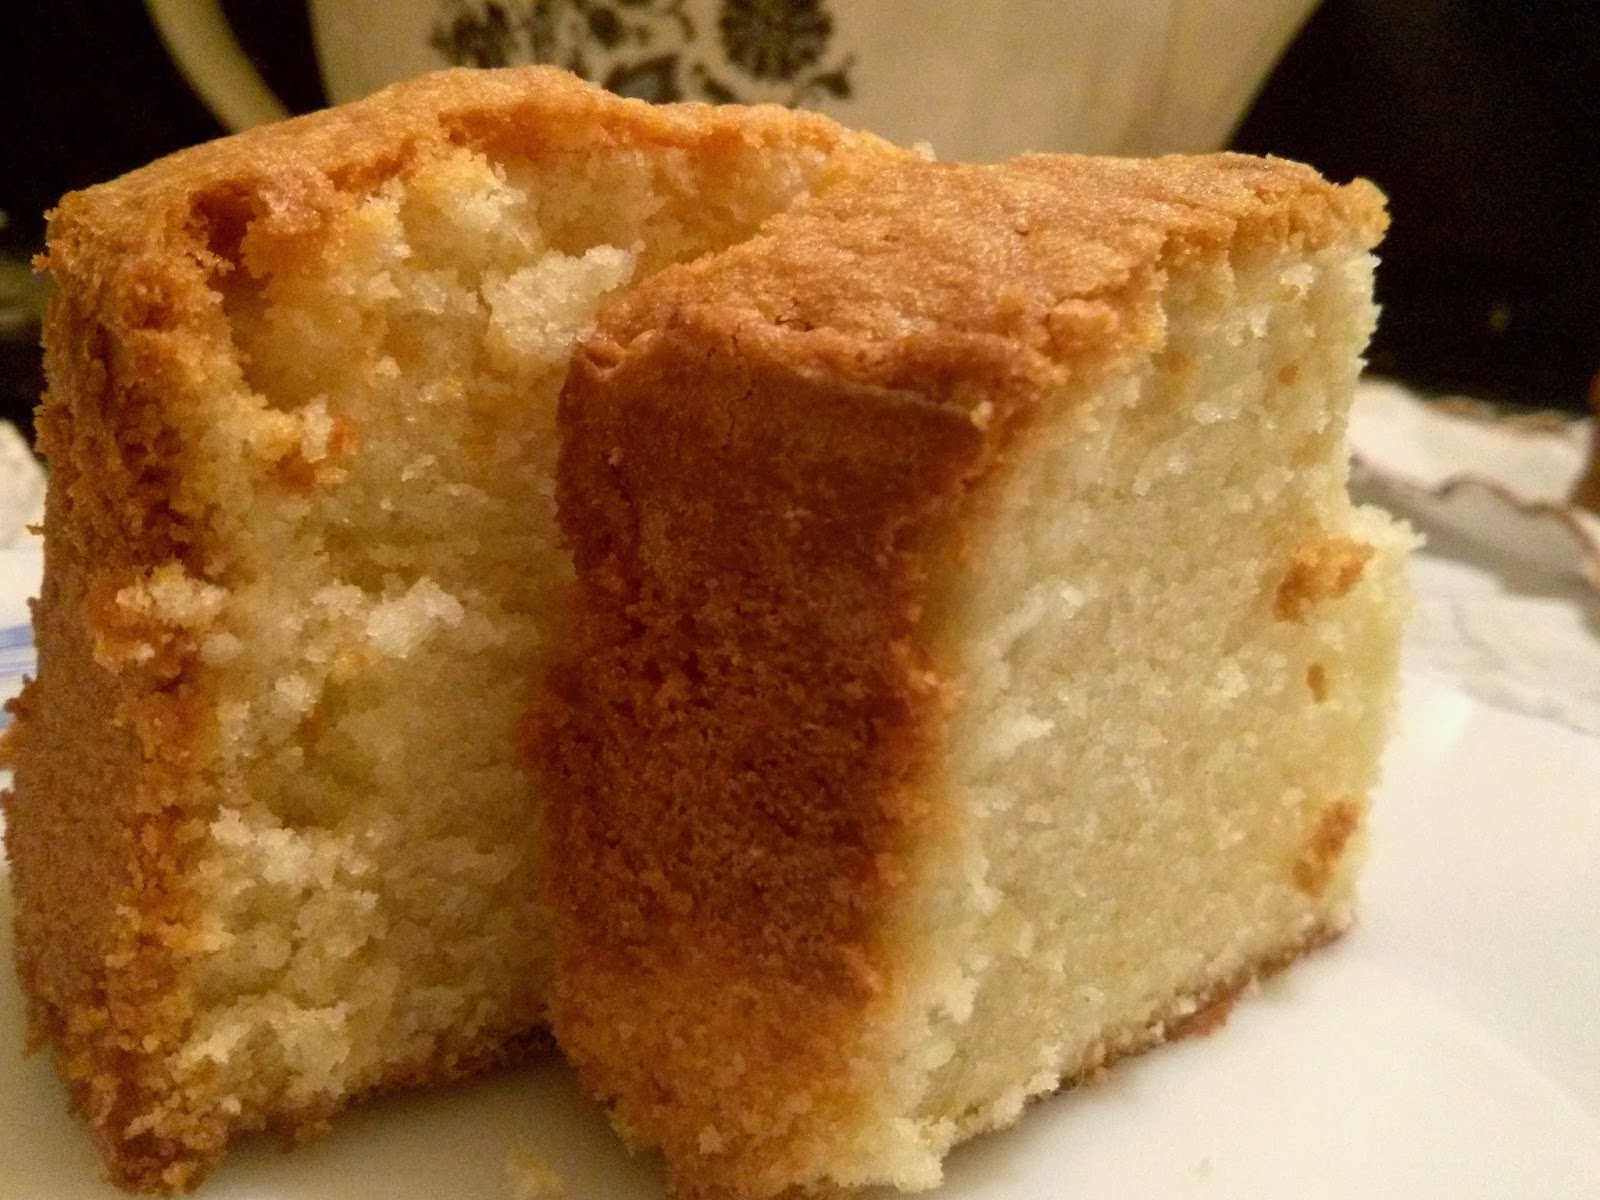 How Much Flour Do U Need To Make A Cake